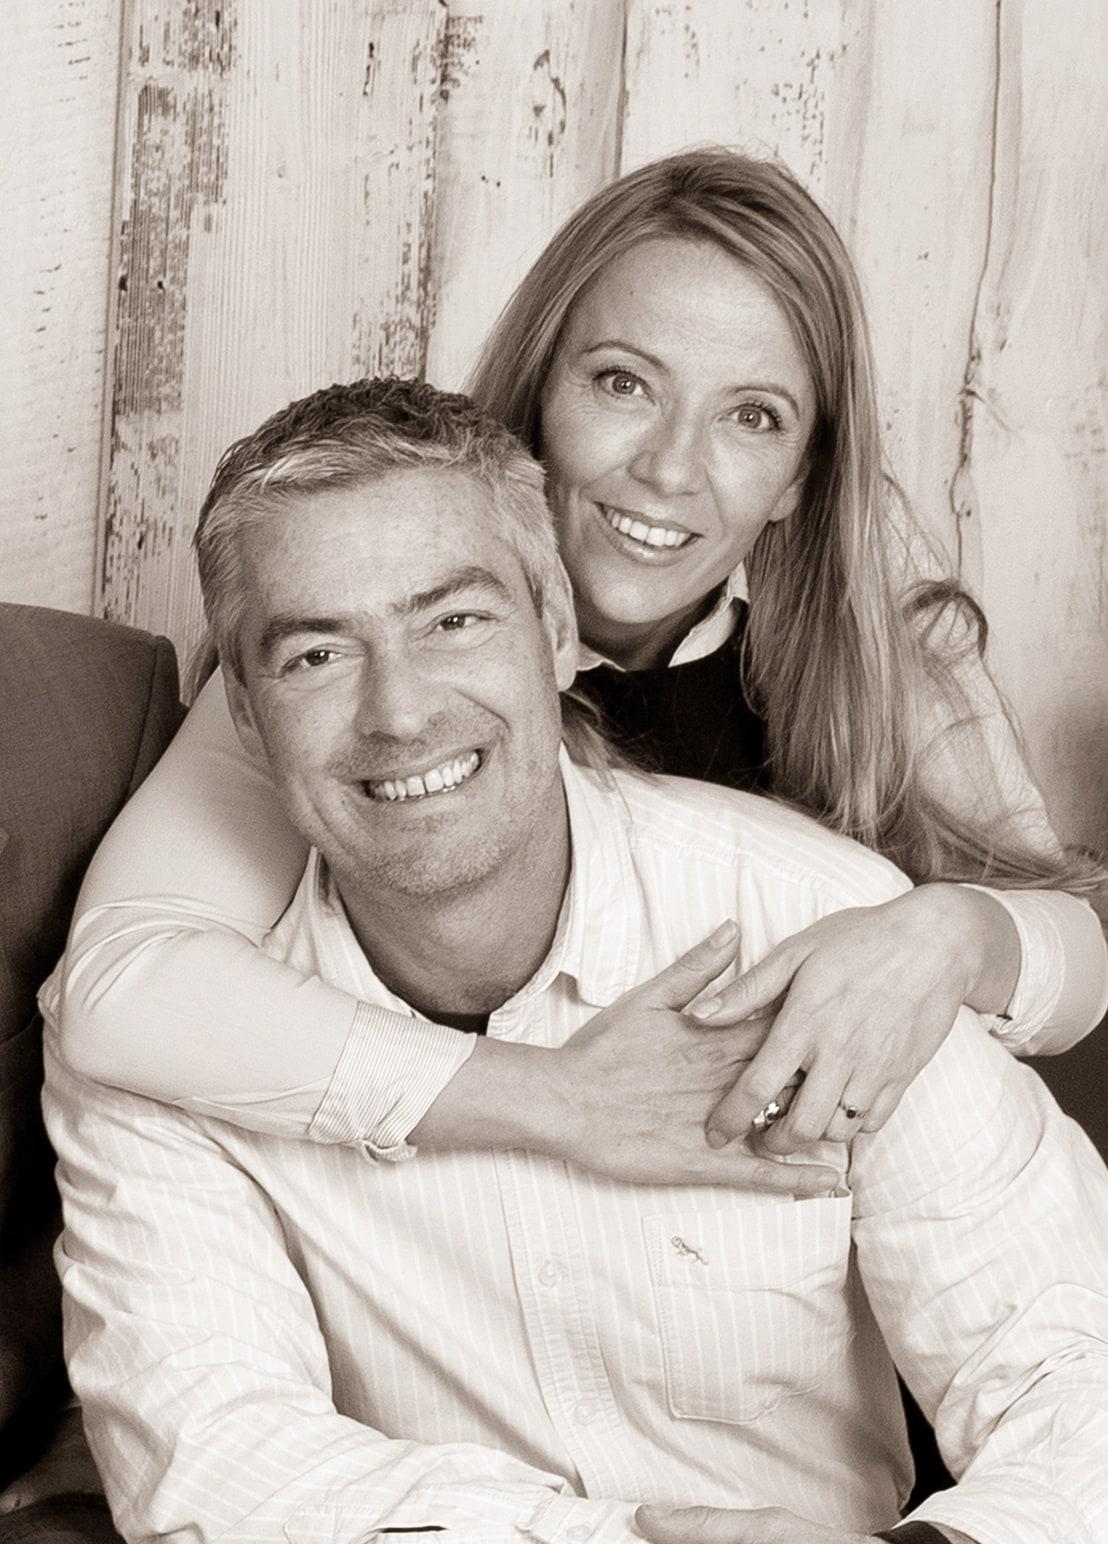 Gerald & Christina from Salzburg